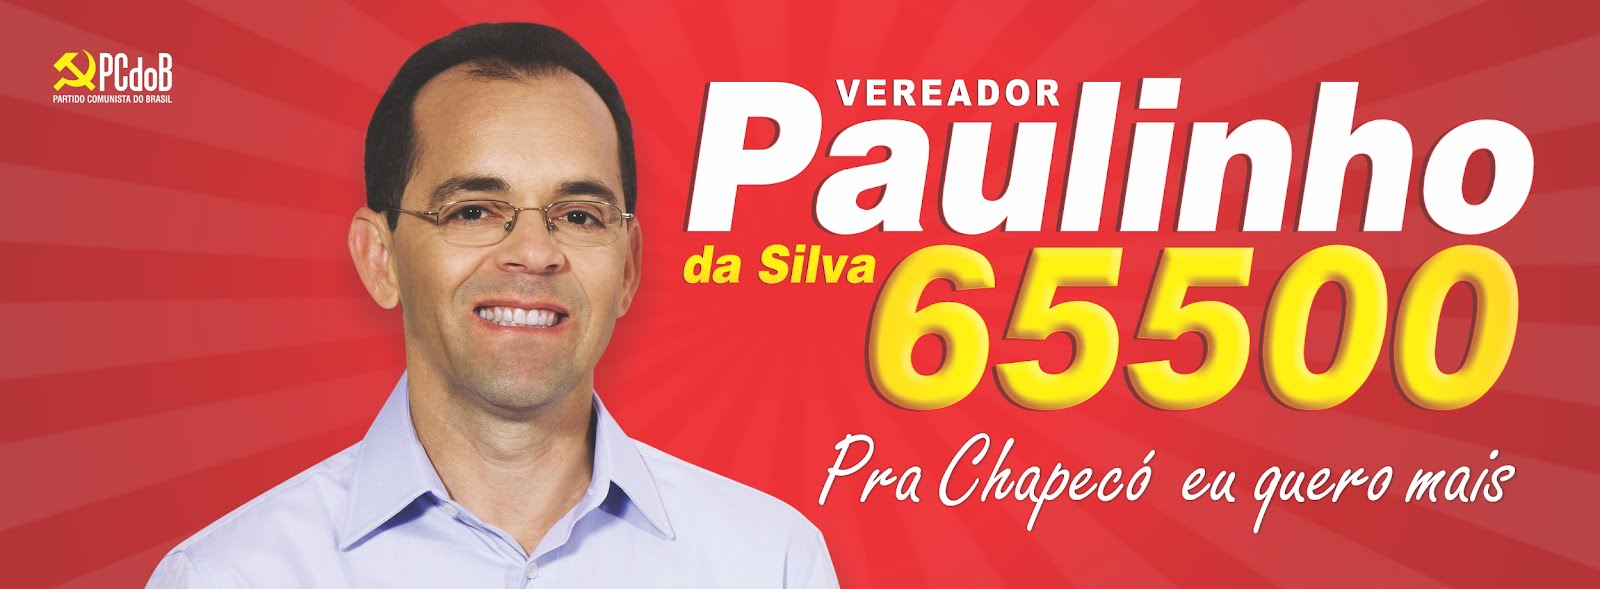 Paulinho da Silva 65500